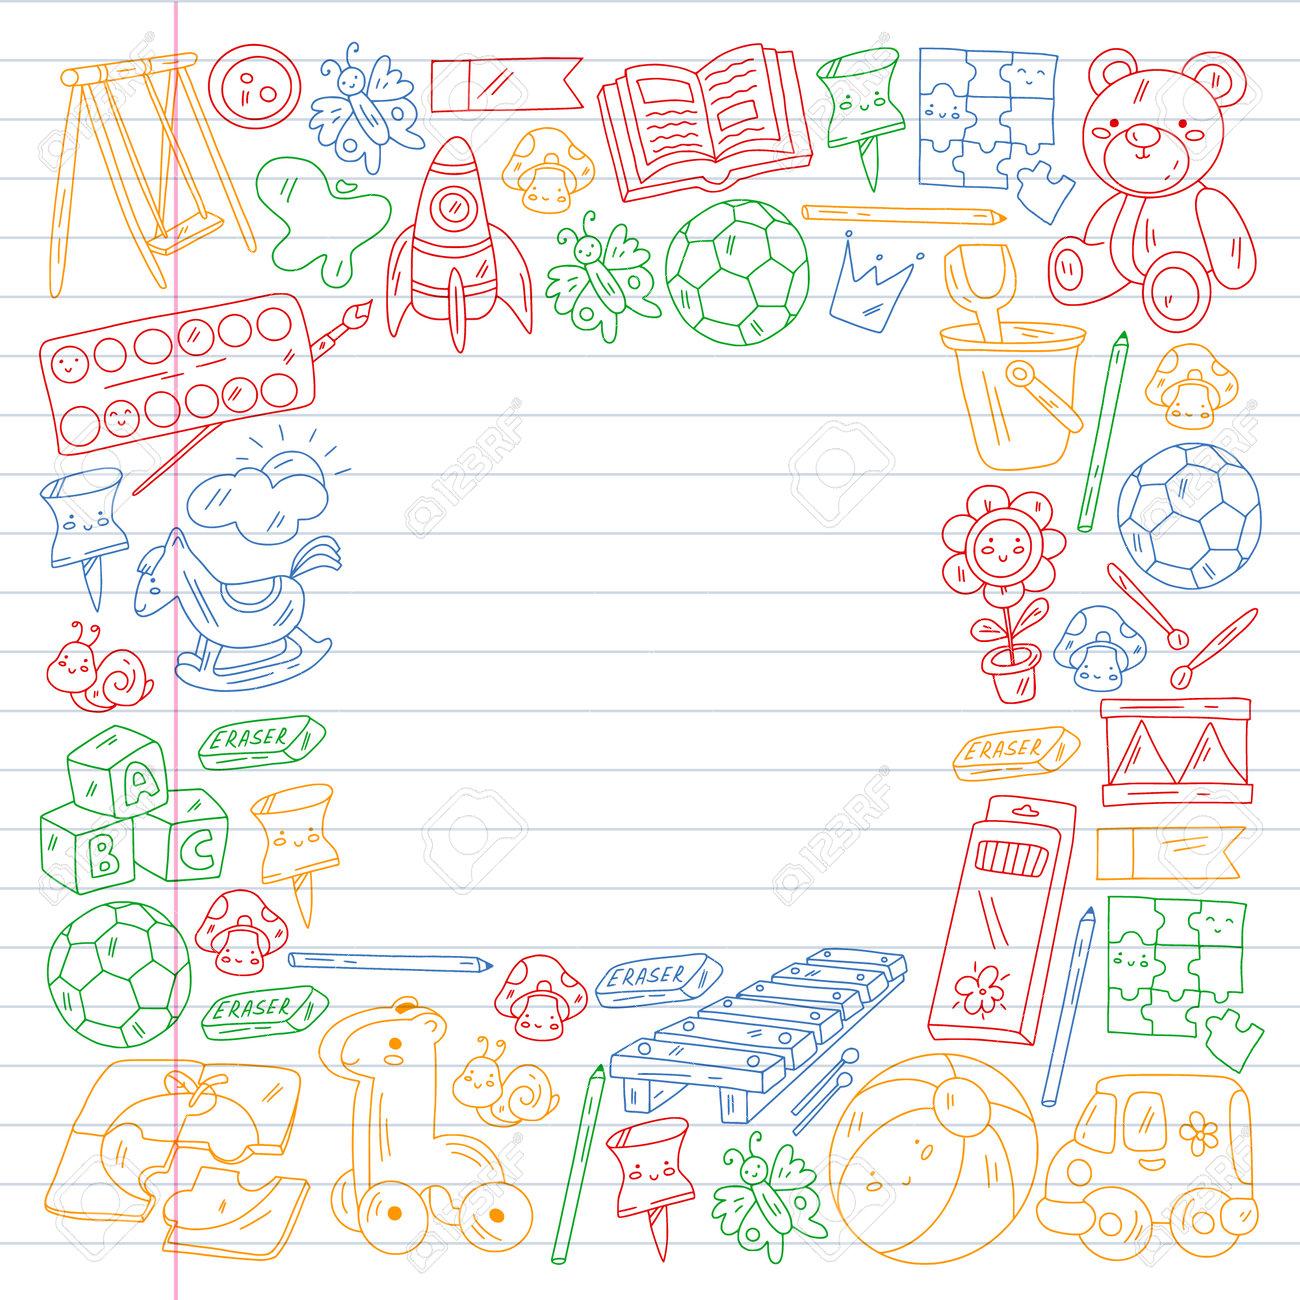 Children play with toys in the kindergarten. Kids playground. Education, creativity, imagination. - 173370340